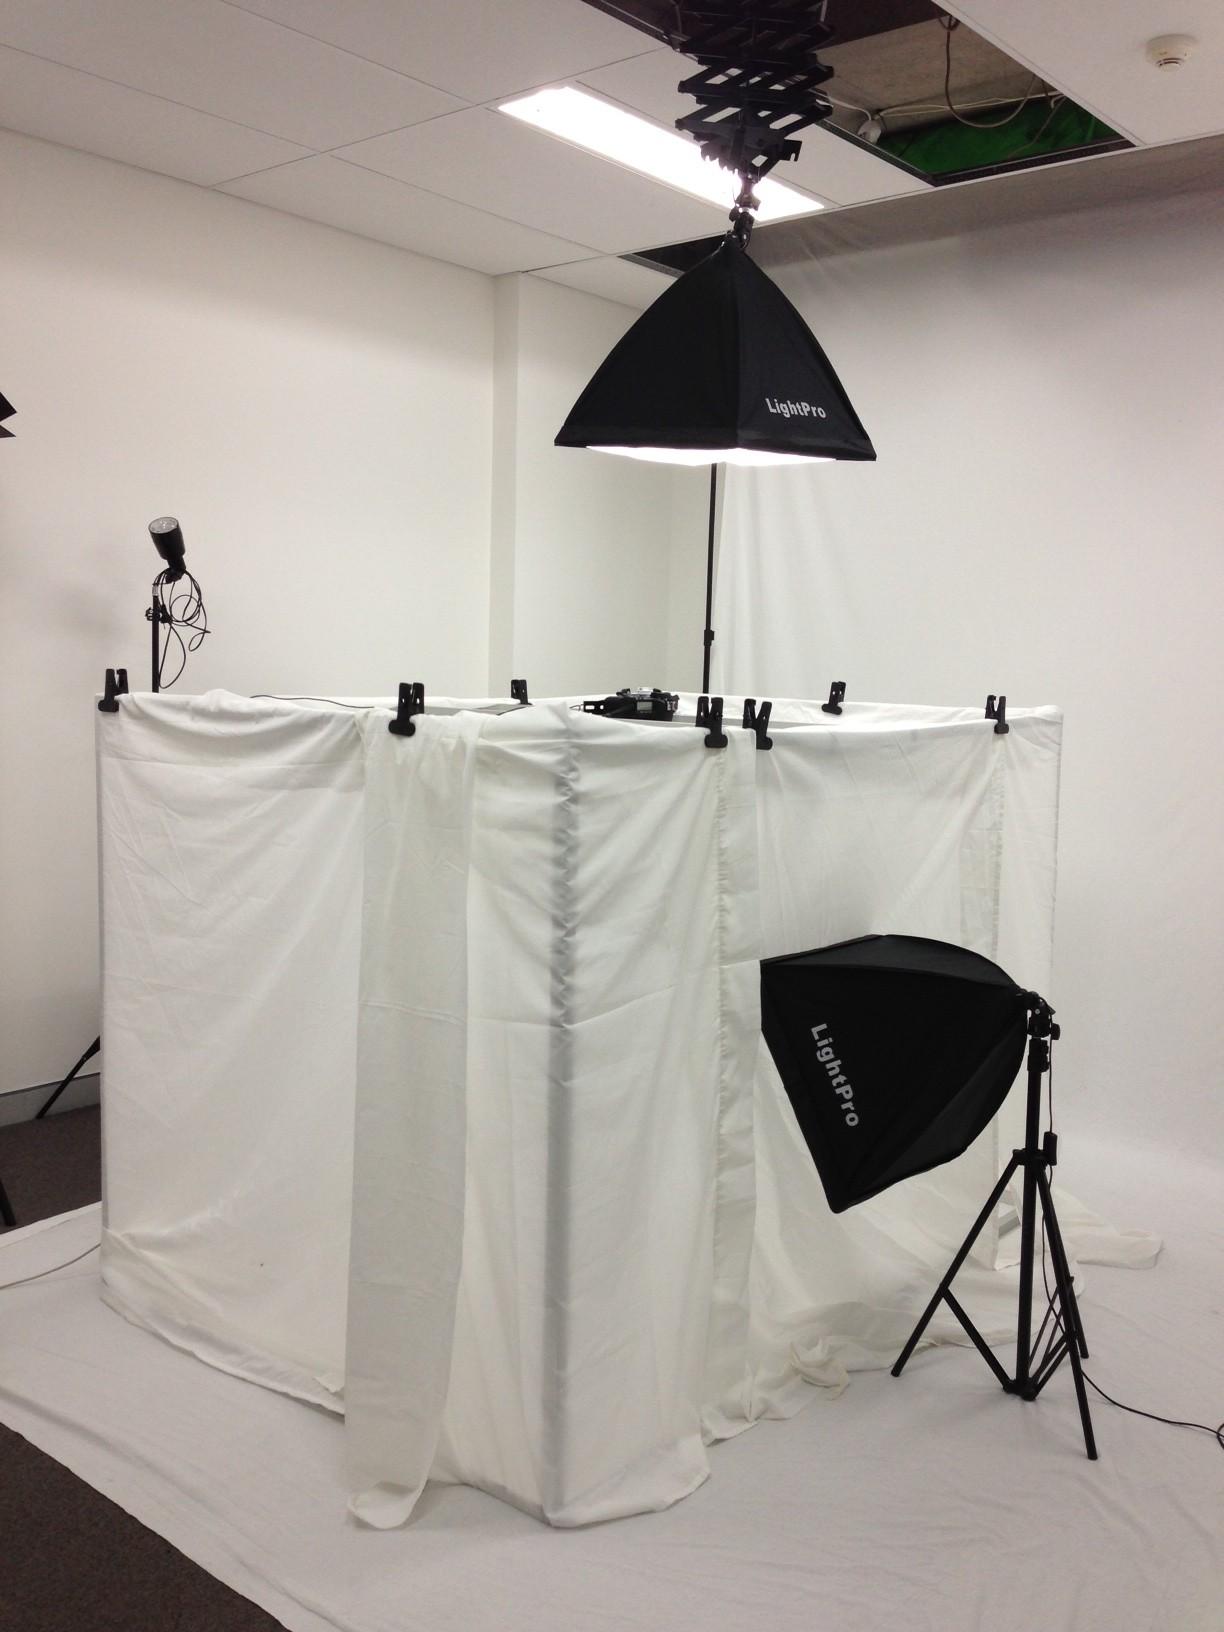 Product photography set